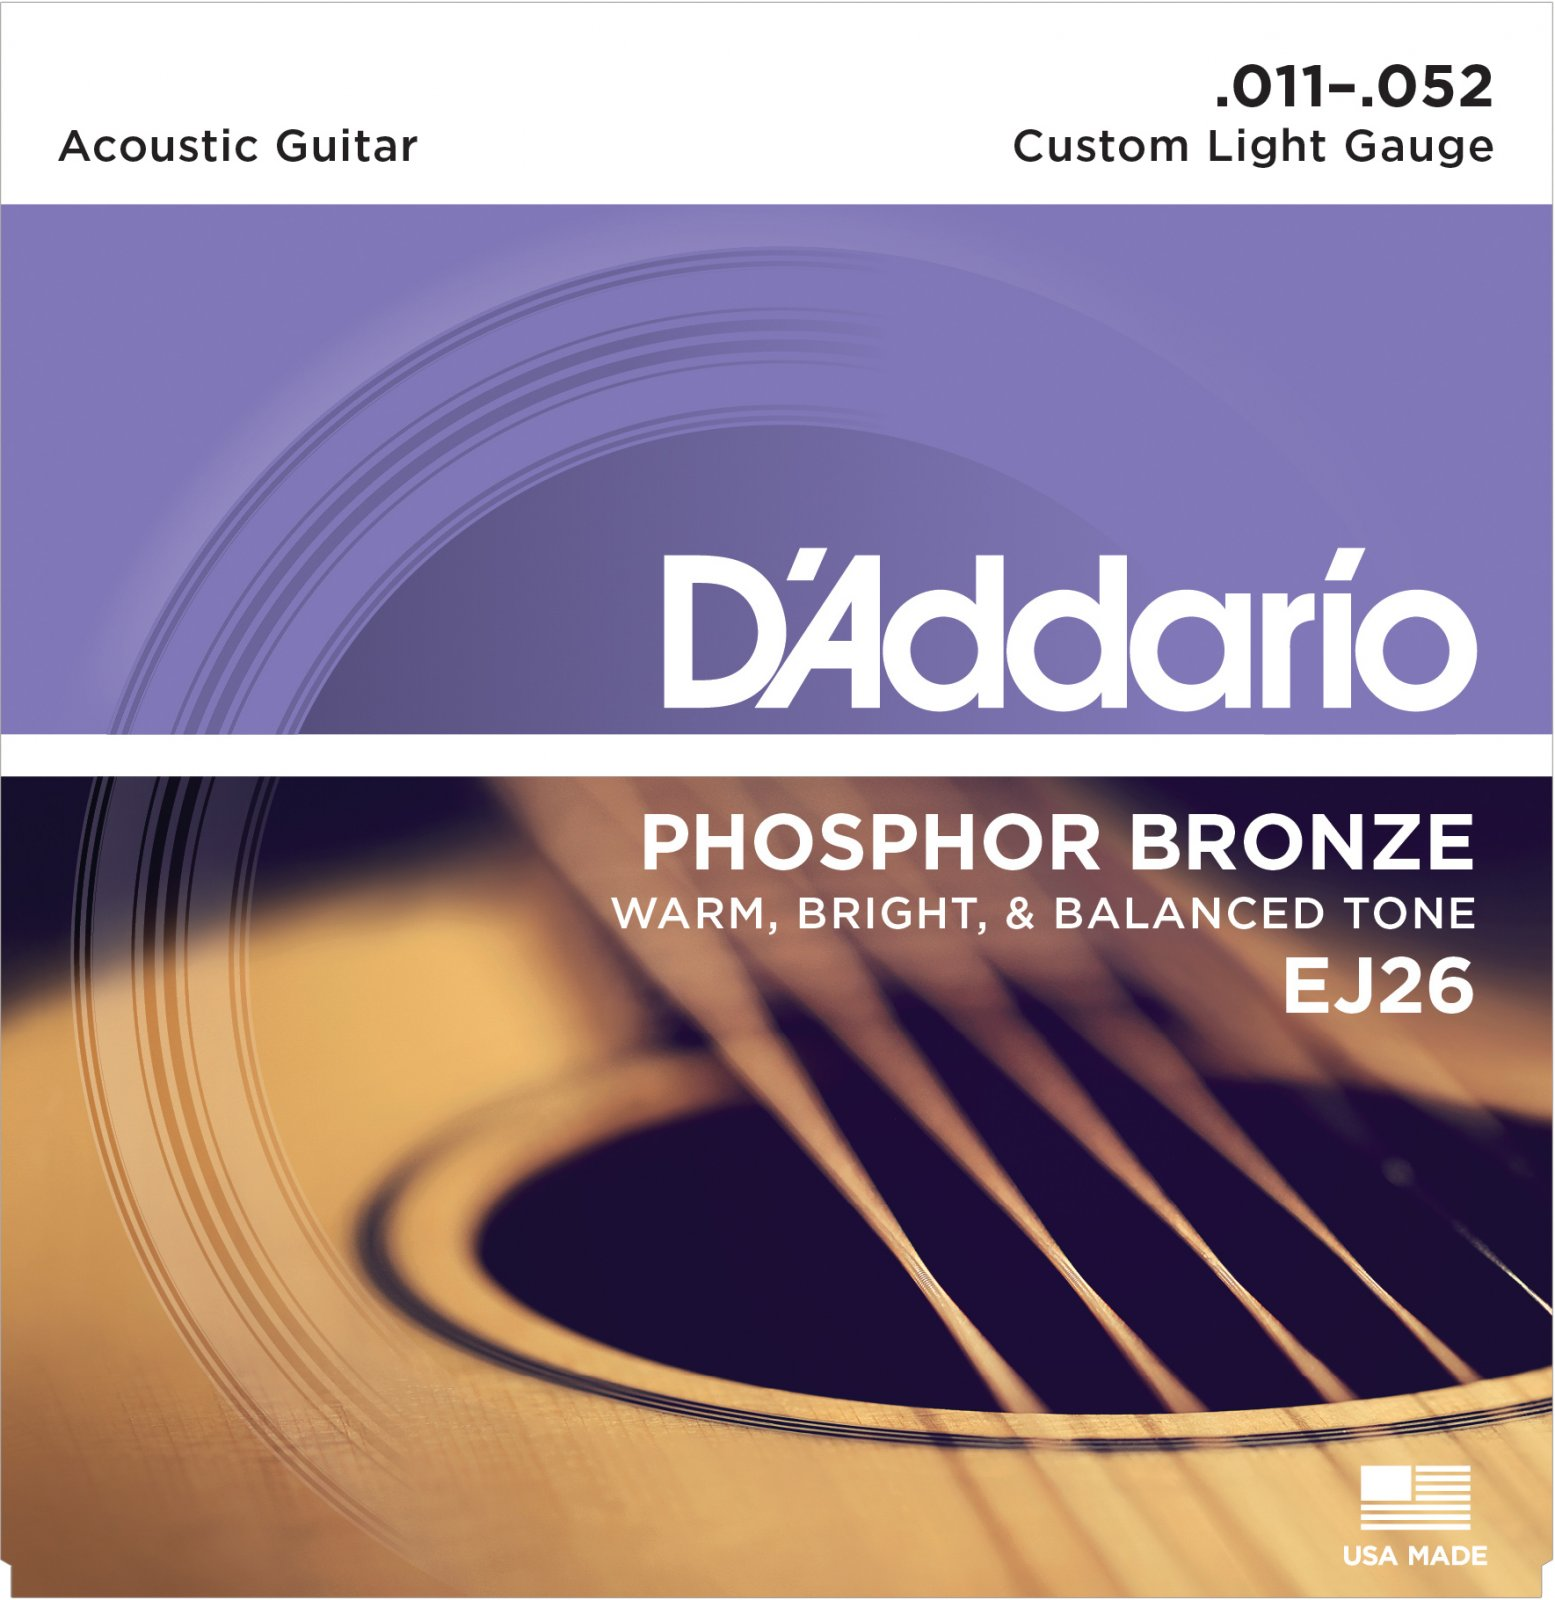 D'Addario EJ26 Phosphor Bronze Custom Light 11-52